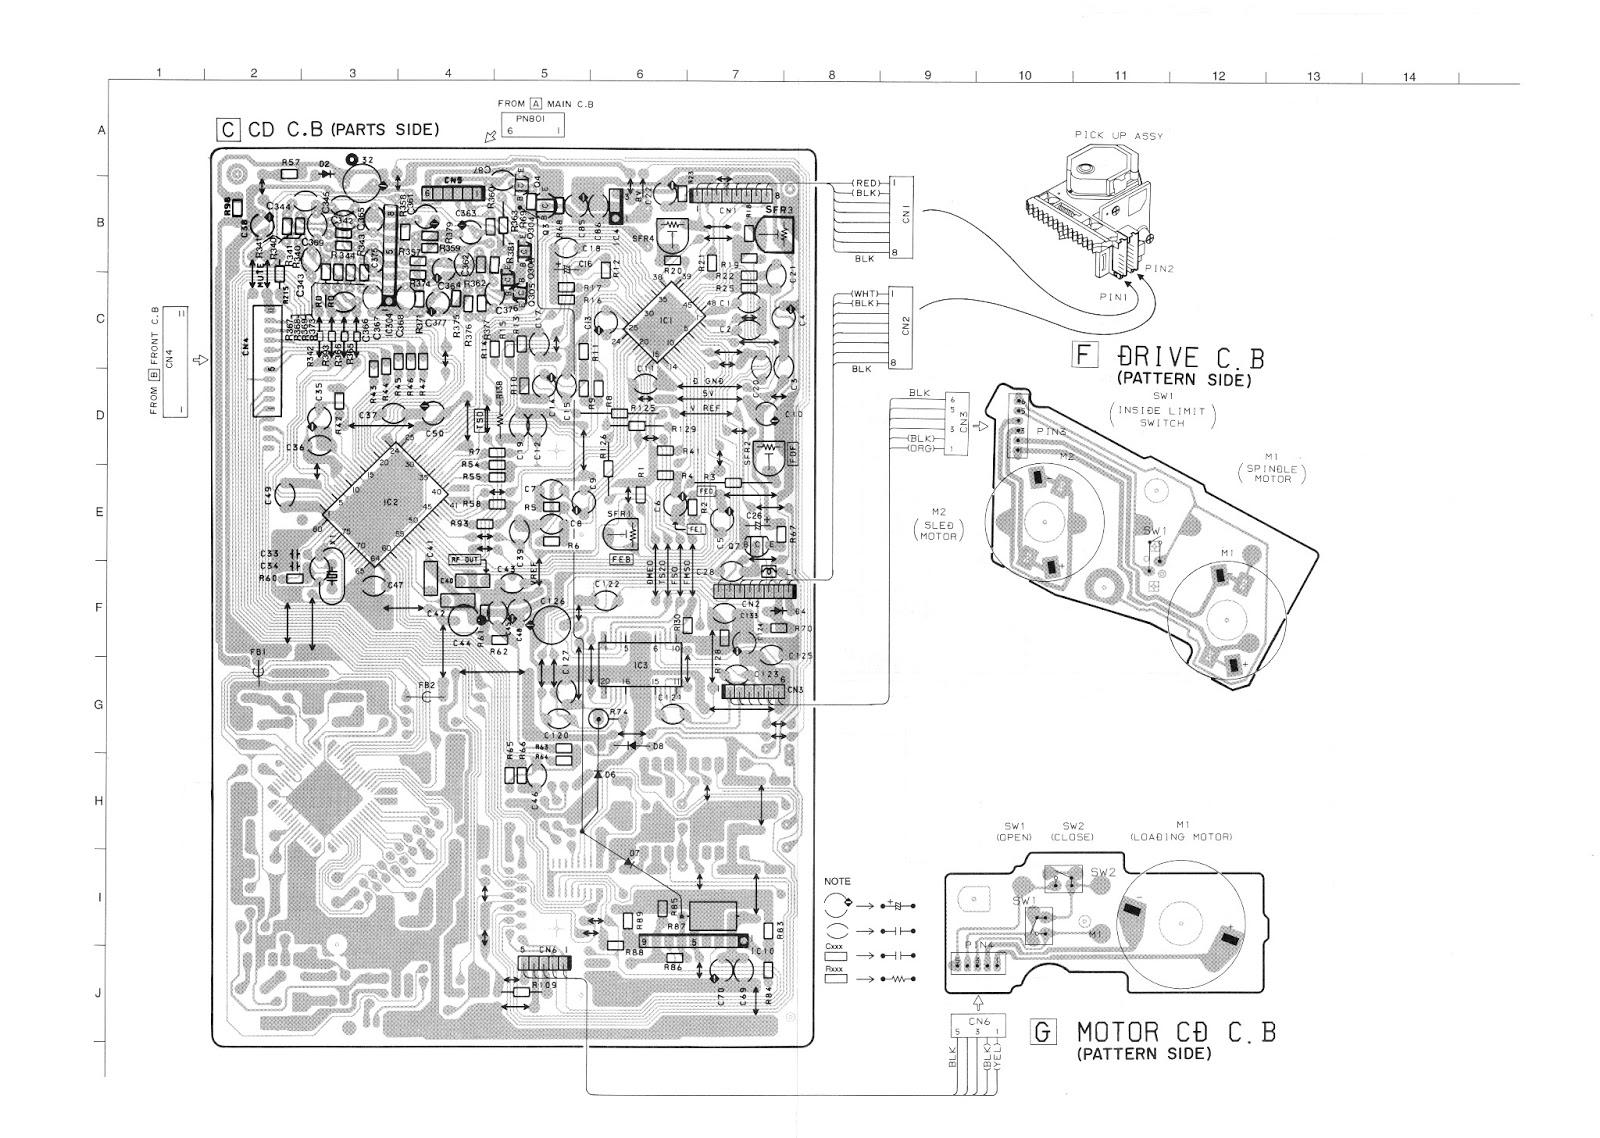 1997 Ford F150 Cd Player Wiring Diagram Com